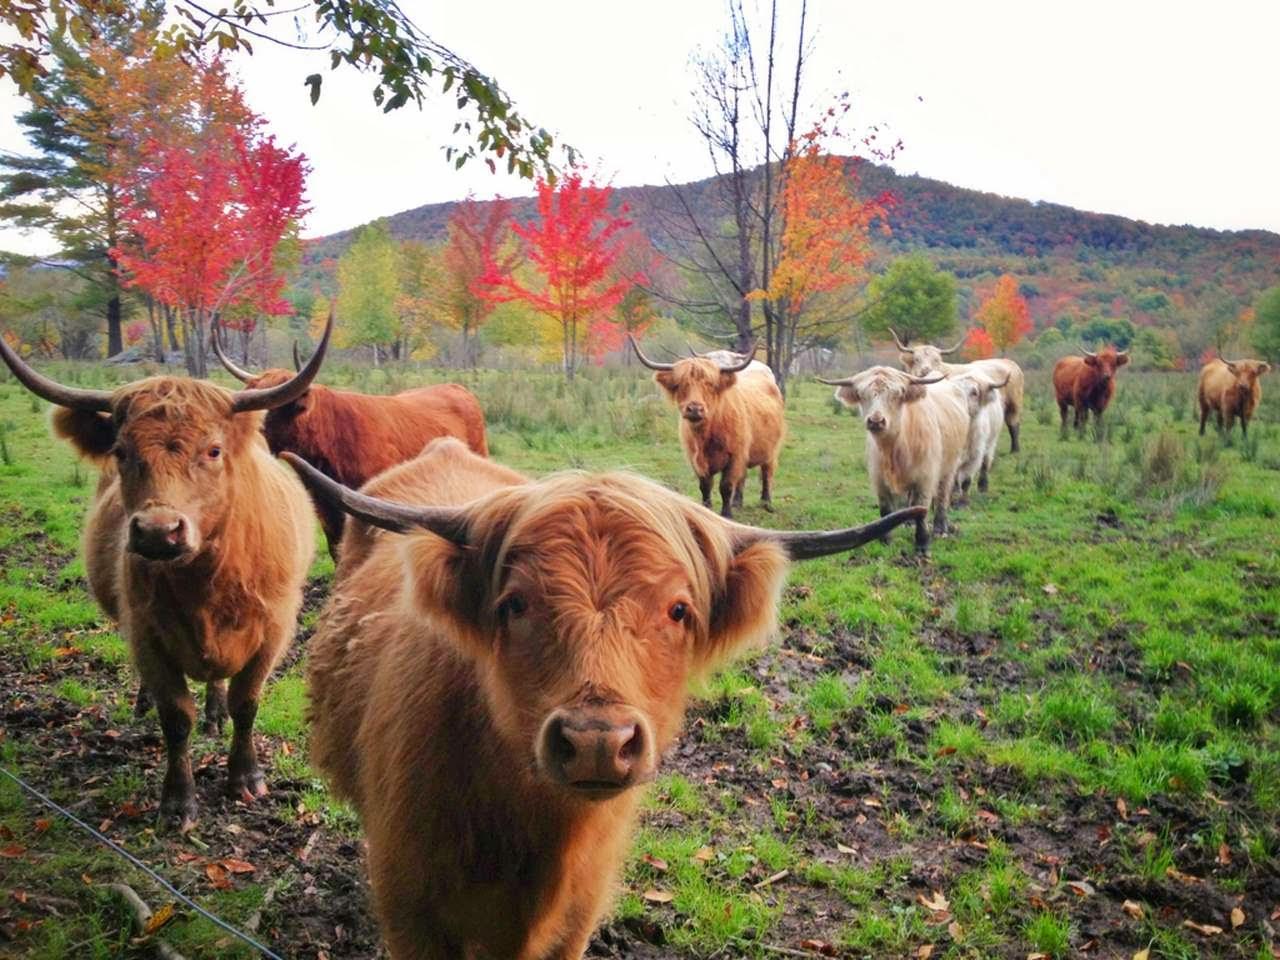 Funny animals of the week - 1 November 2013 (30 pics ...